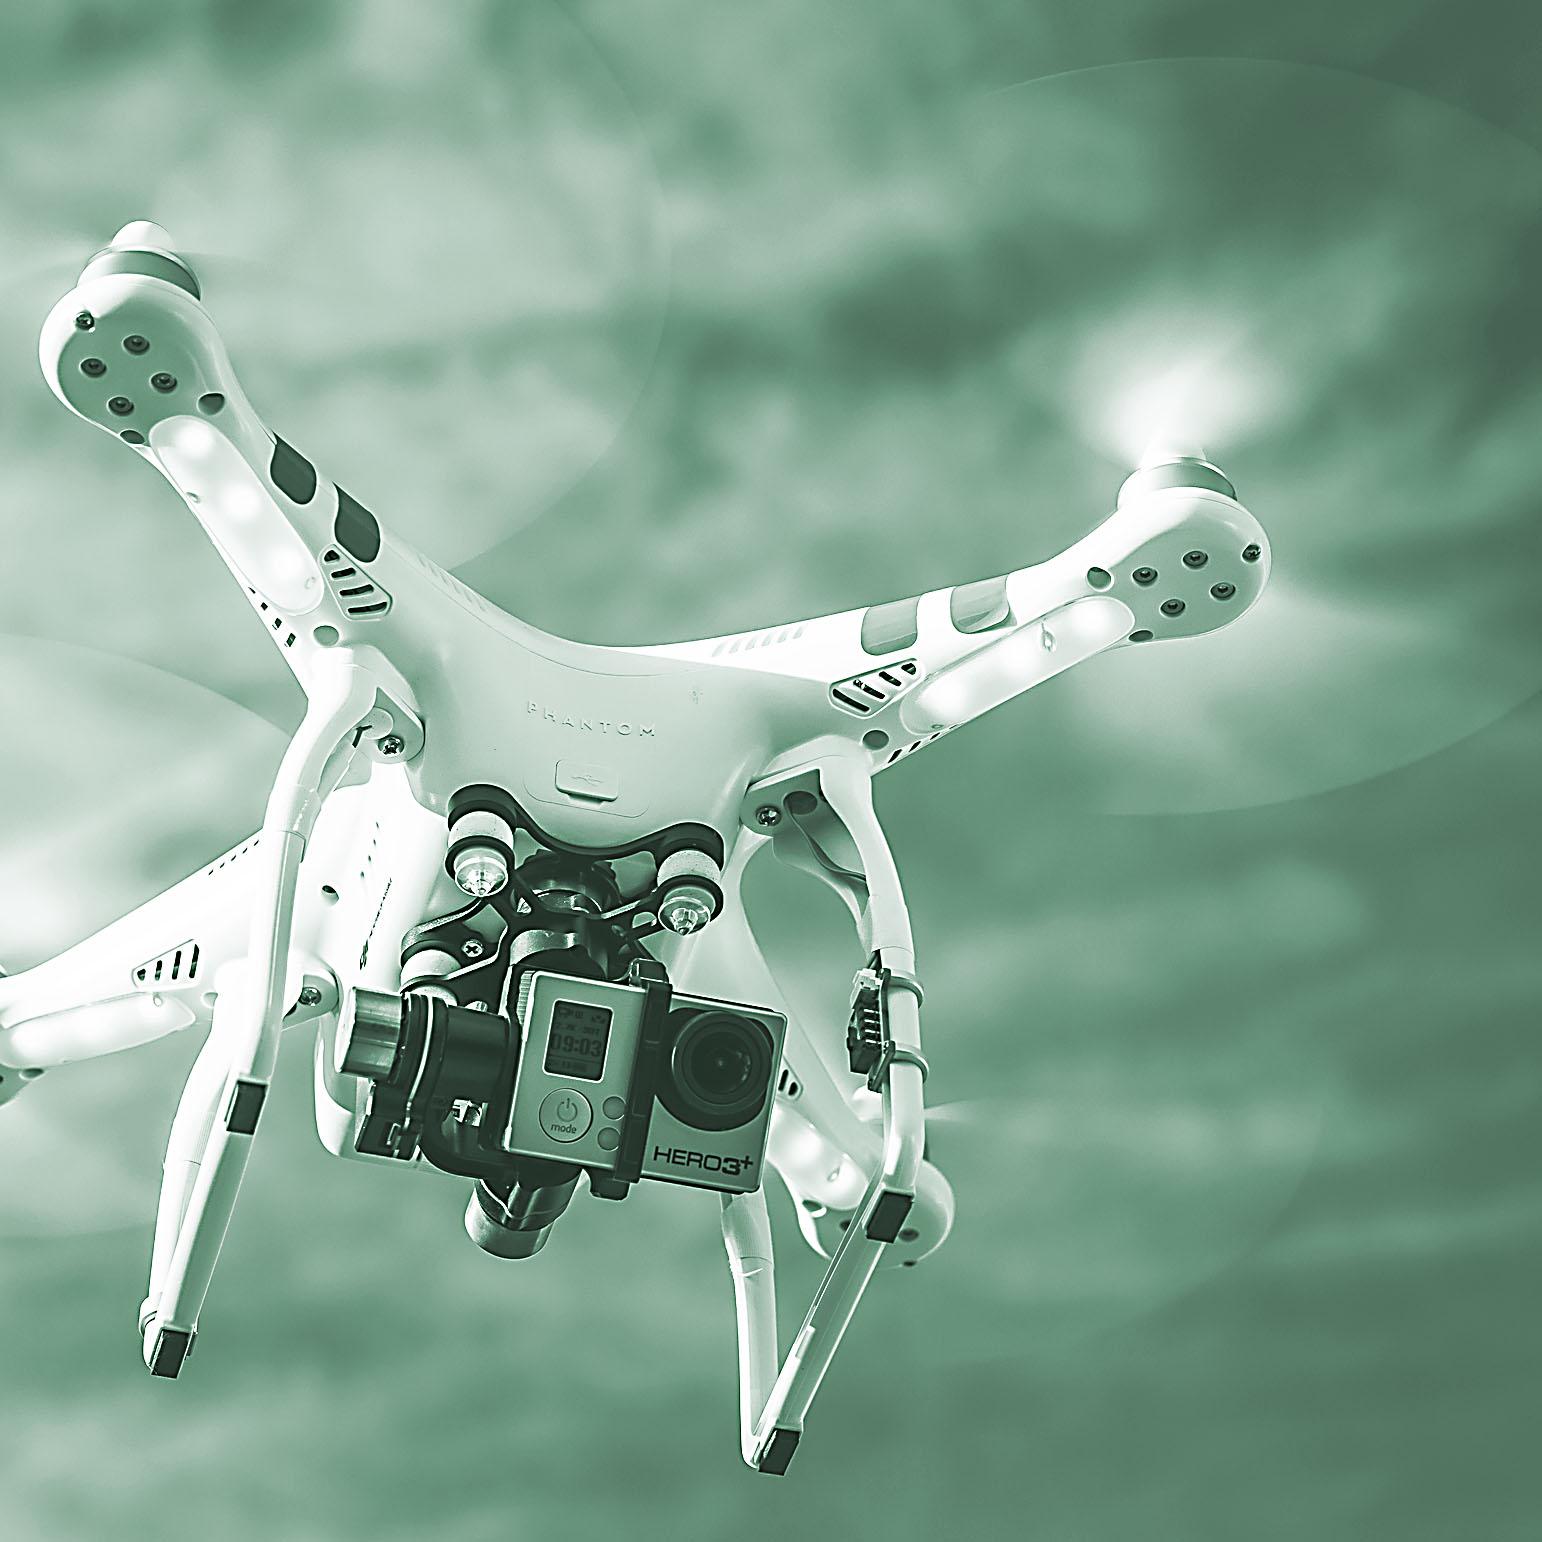 drone farm photo